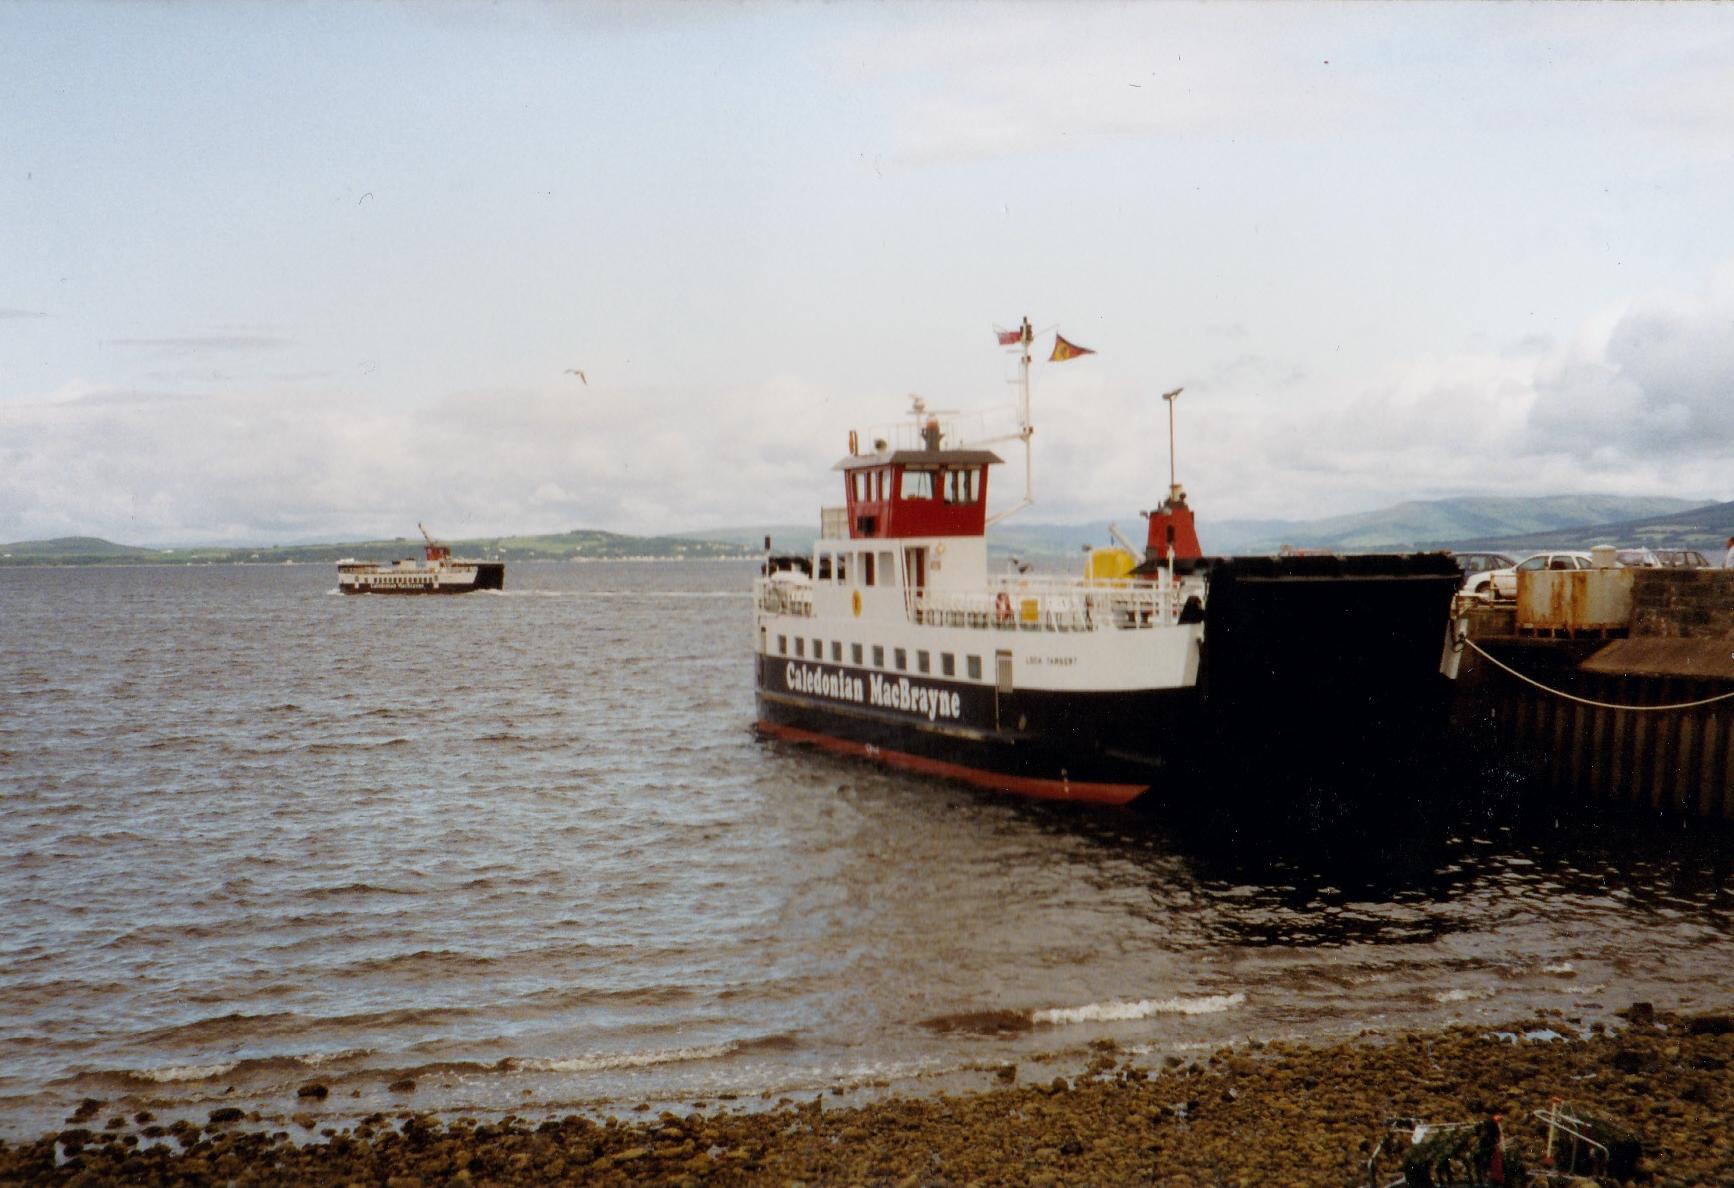 Loch Striven crossing to Cumbrae Slip (Jim Aikman Smith)